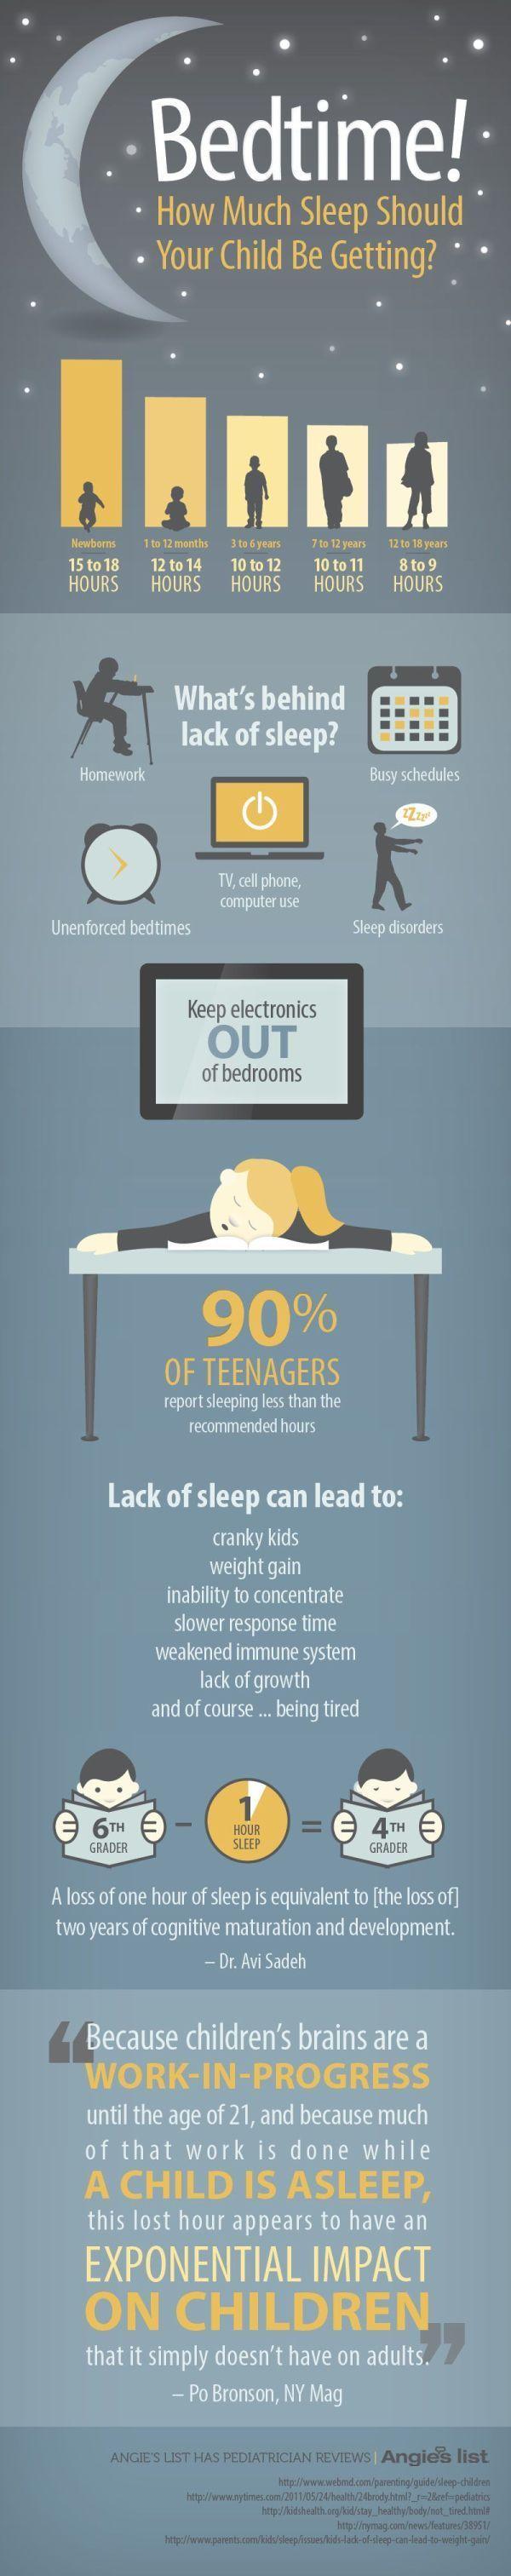 How much sleep do they need?